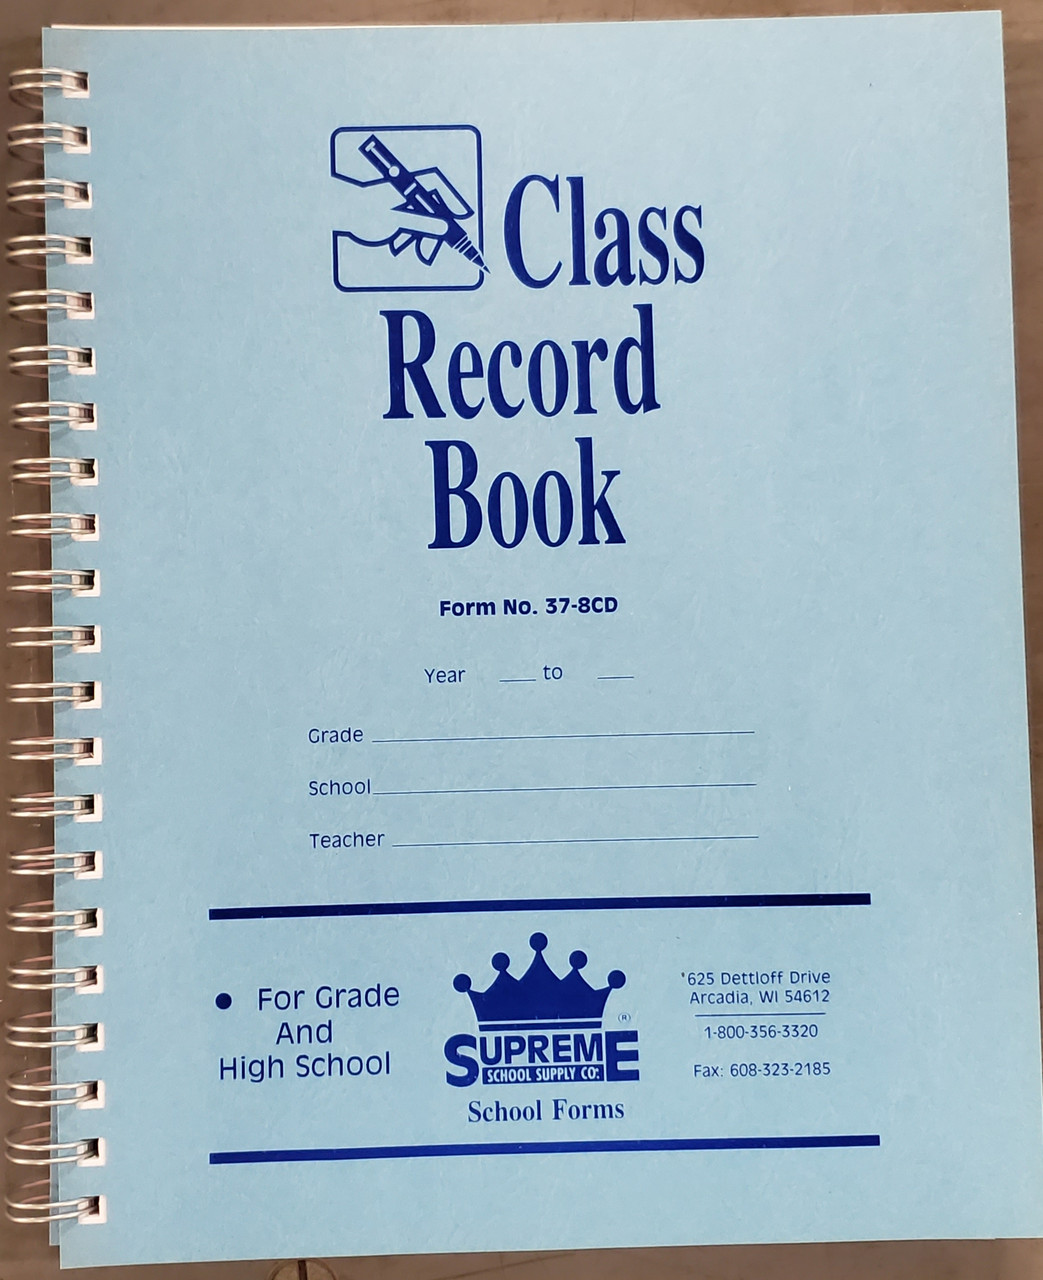 Class Record & Duplicate Plan Book (37-8CD)